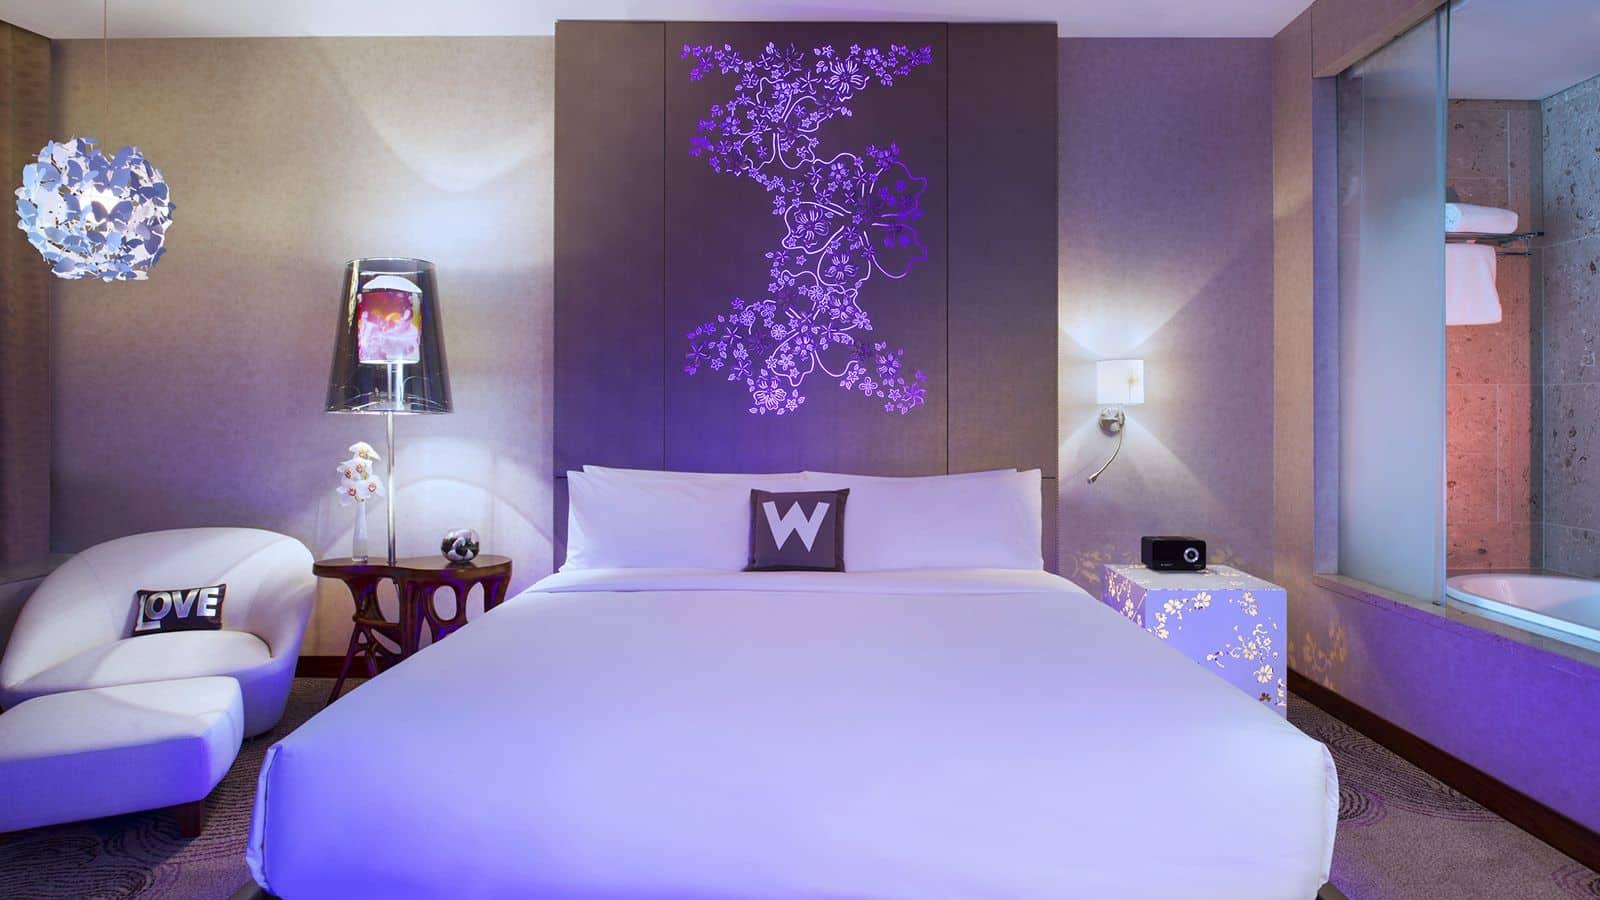 W Hotel Singapore